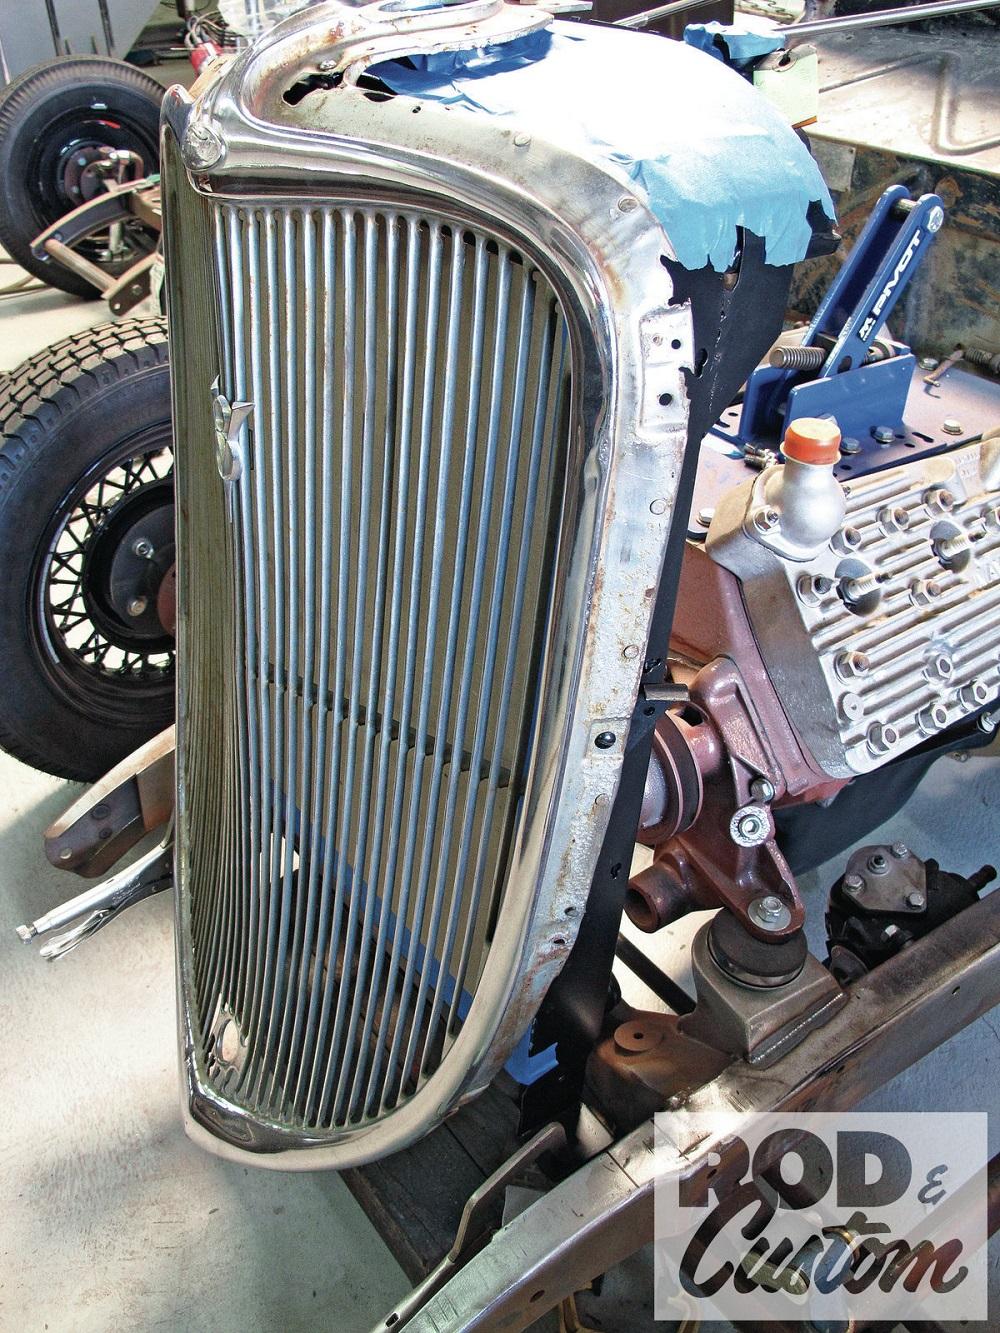 1933 Ford Tudor Original Grille. Credit to Rod & Custom.